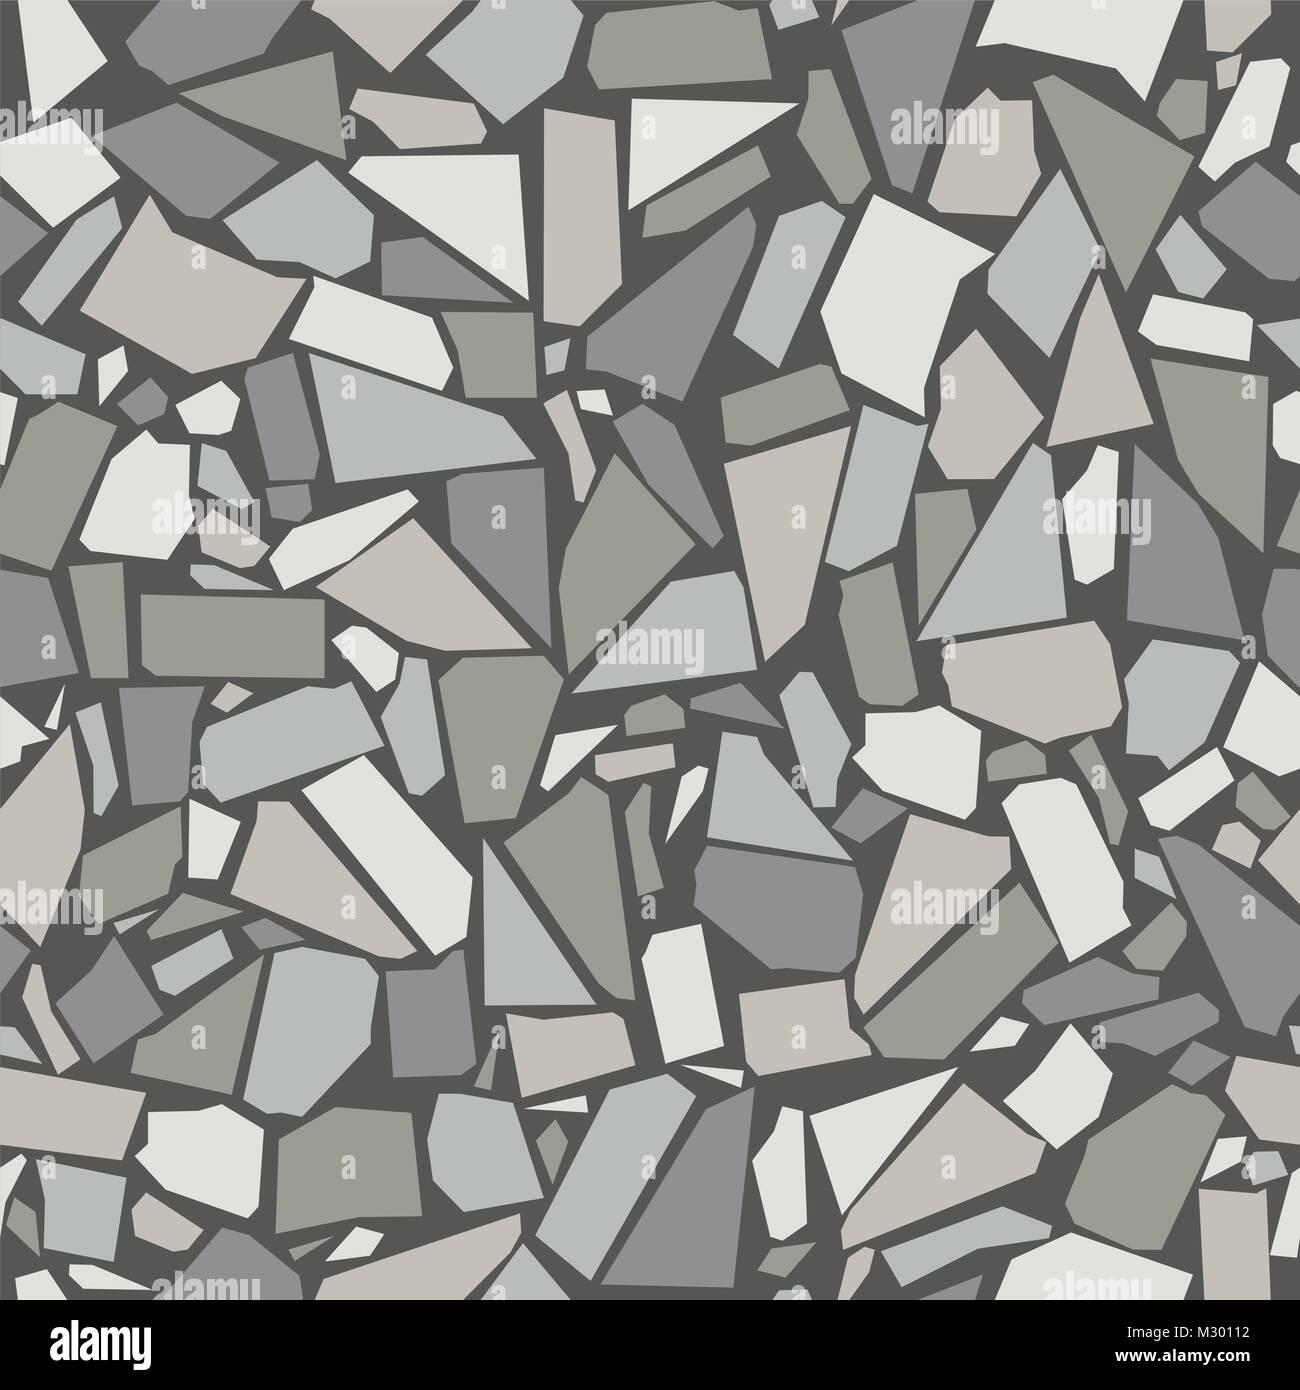 Vector Gray Vintage Ceramic Tiles Wall Decoration Seamless Pattern Stock Vector Image Art Alamy